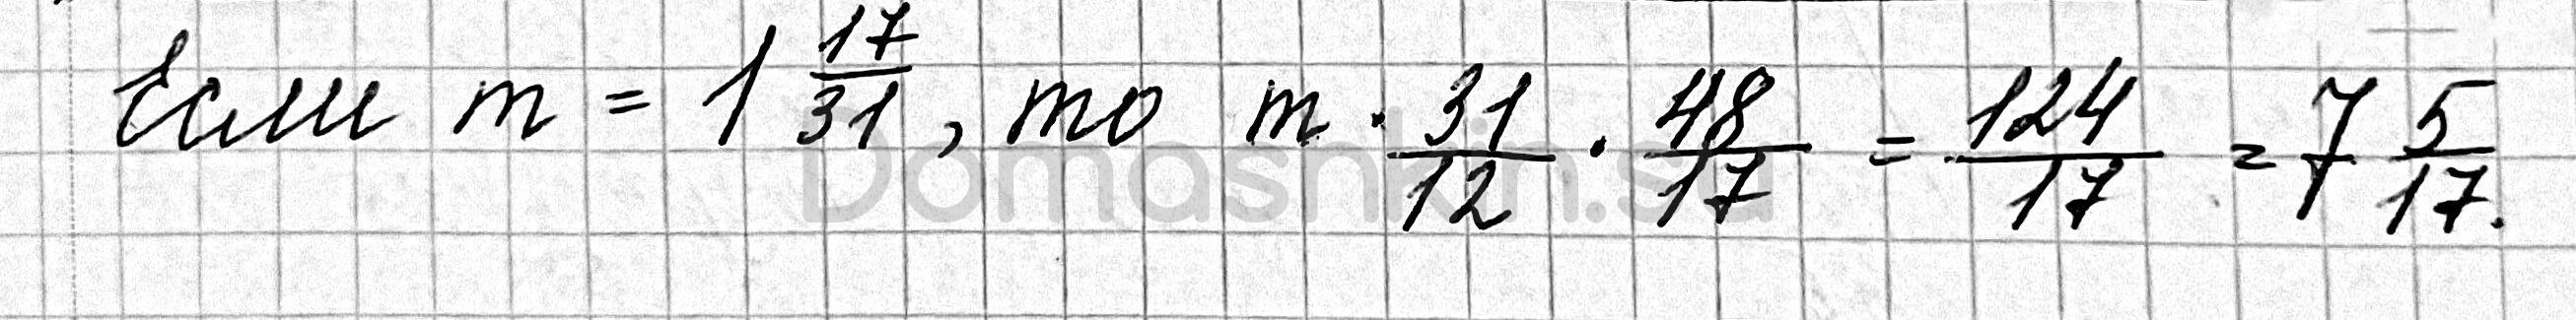 Математика 6 класс учебник Мерзляк номер 361 решение